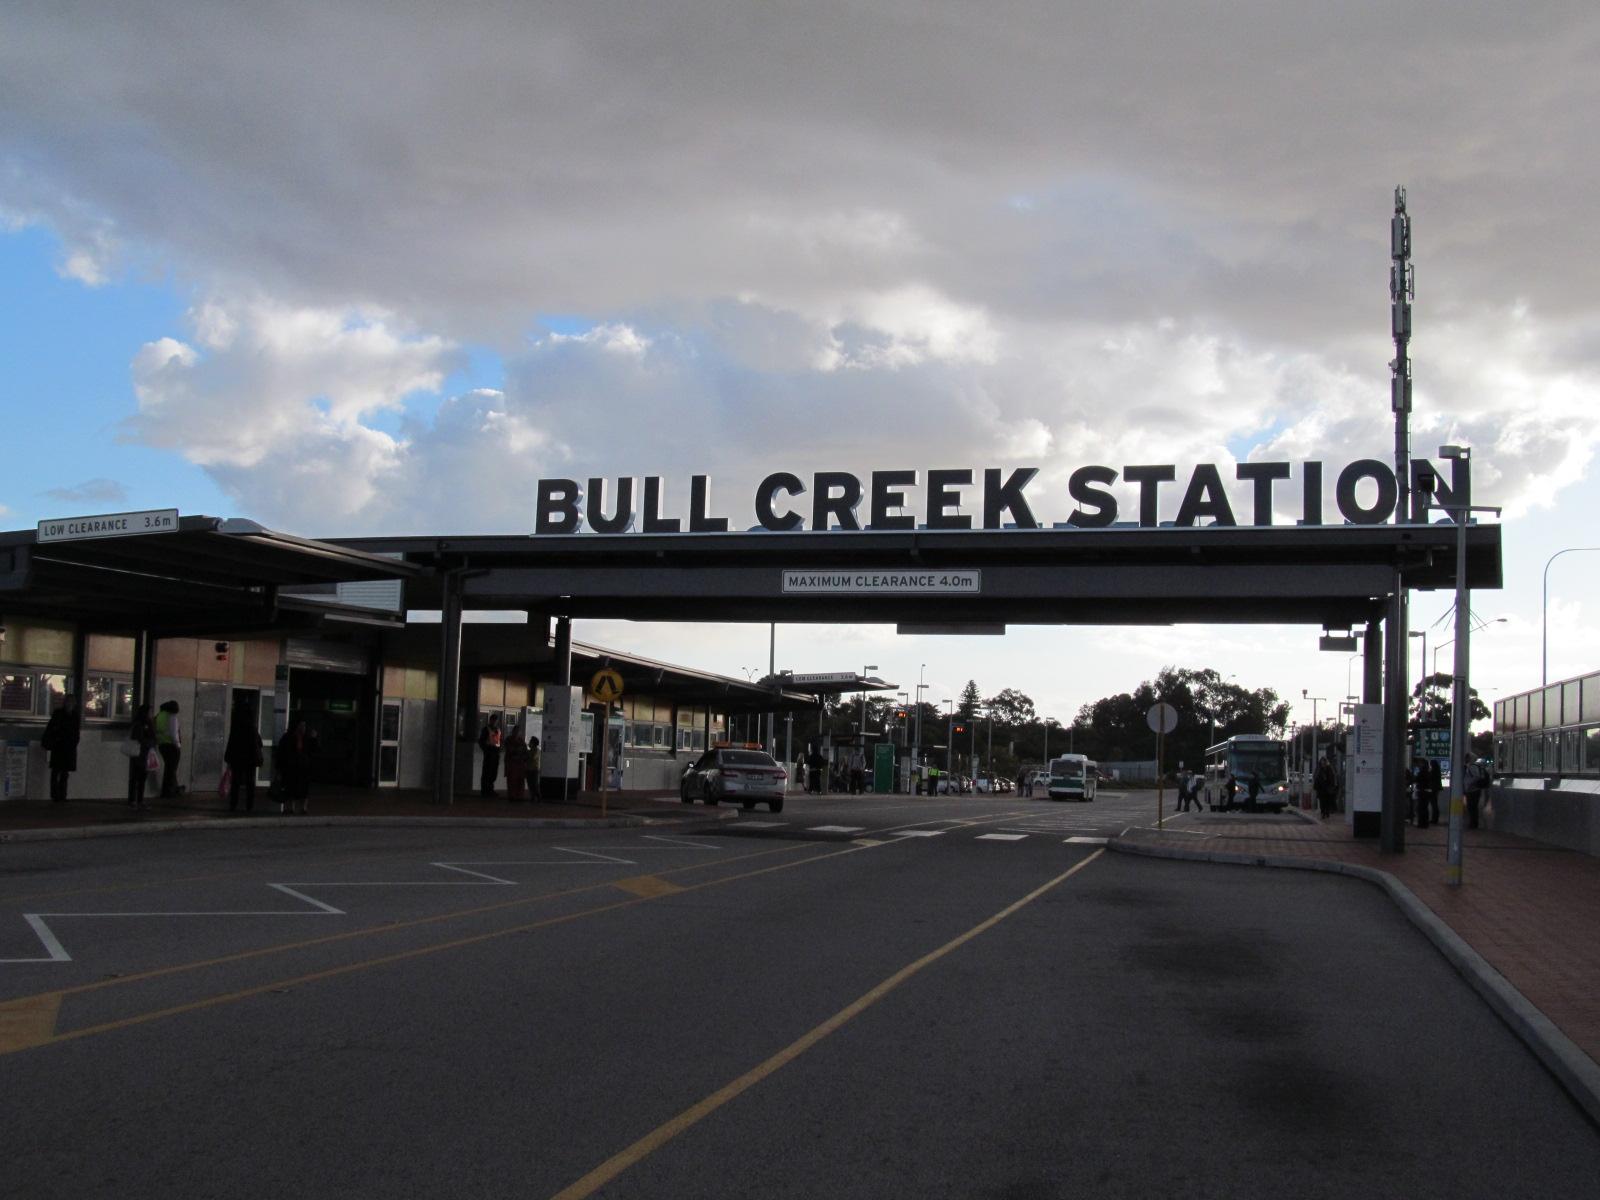 Bull Creek Australia  City new picture : Bull Creek station bus level W Wikimedia Commons